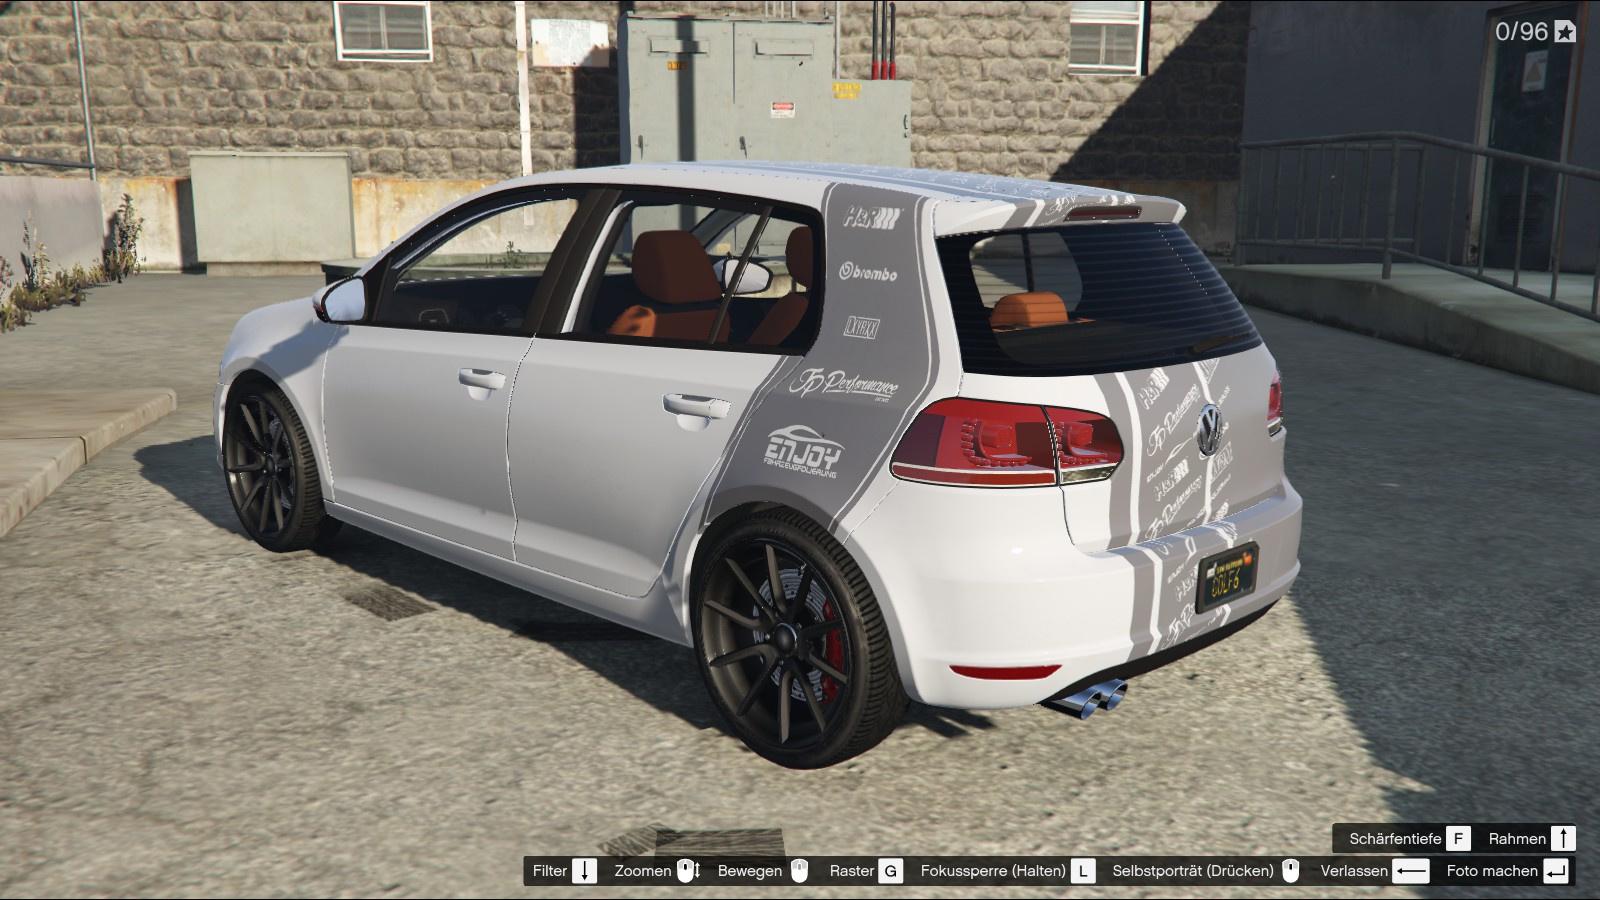 Vw Golf Mk6 Gti Livery Logostripes Jp Performance Enjoy Carwrapping Gta5 Mods Com